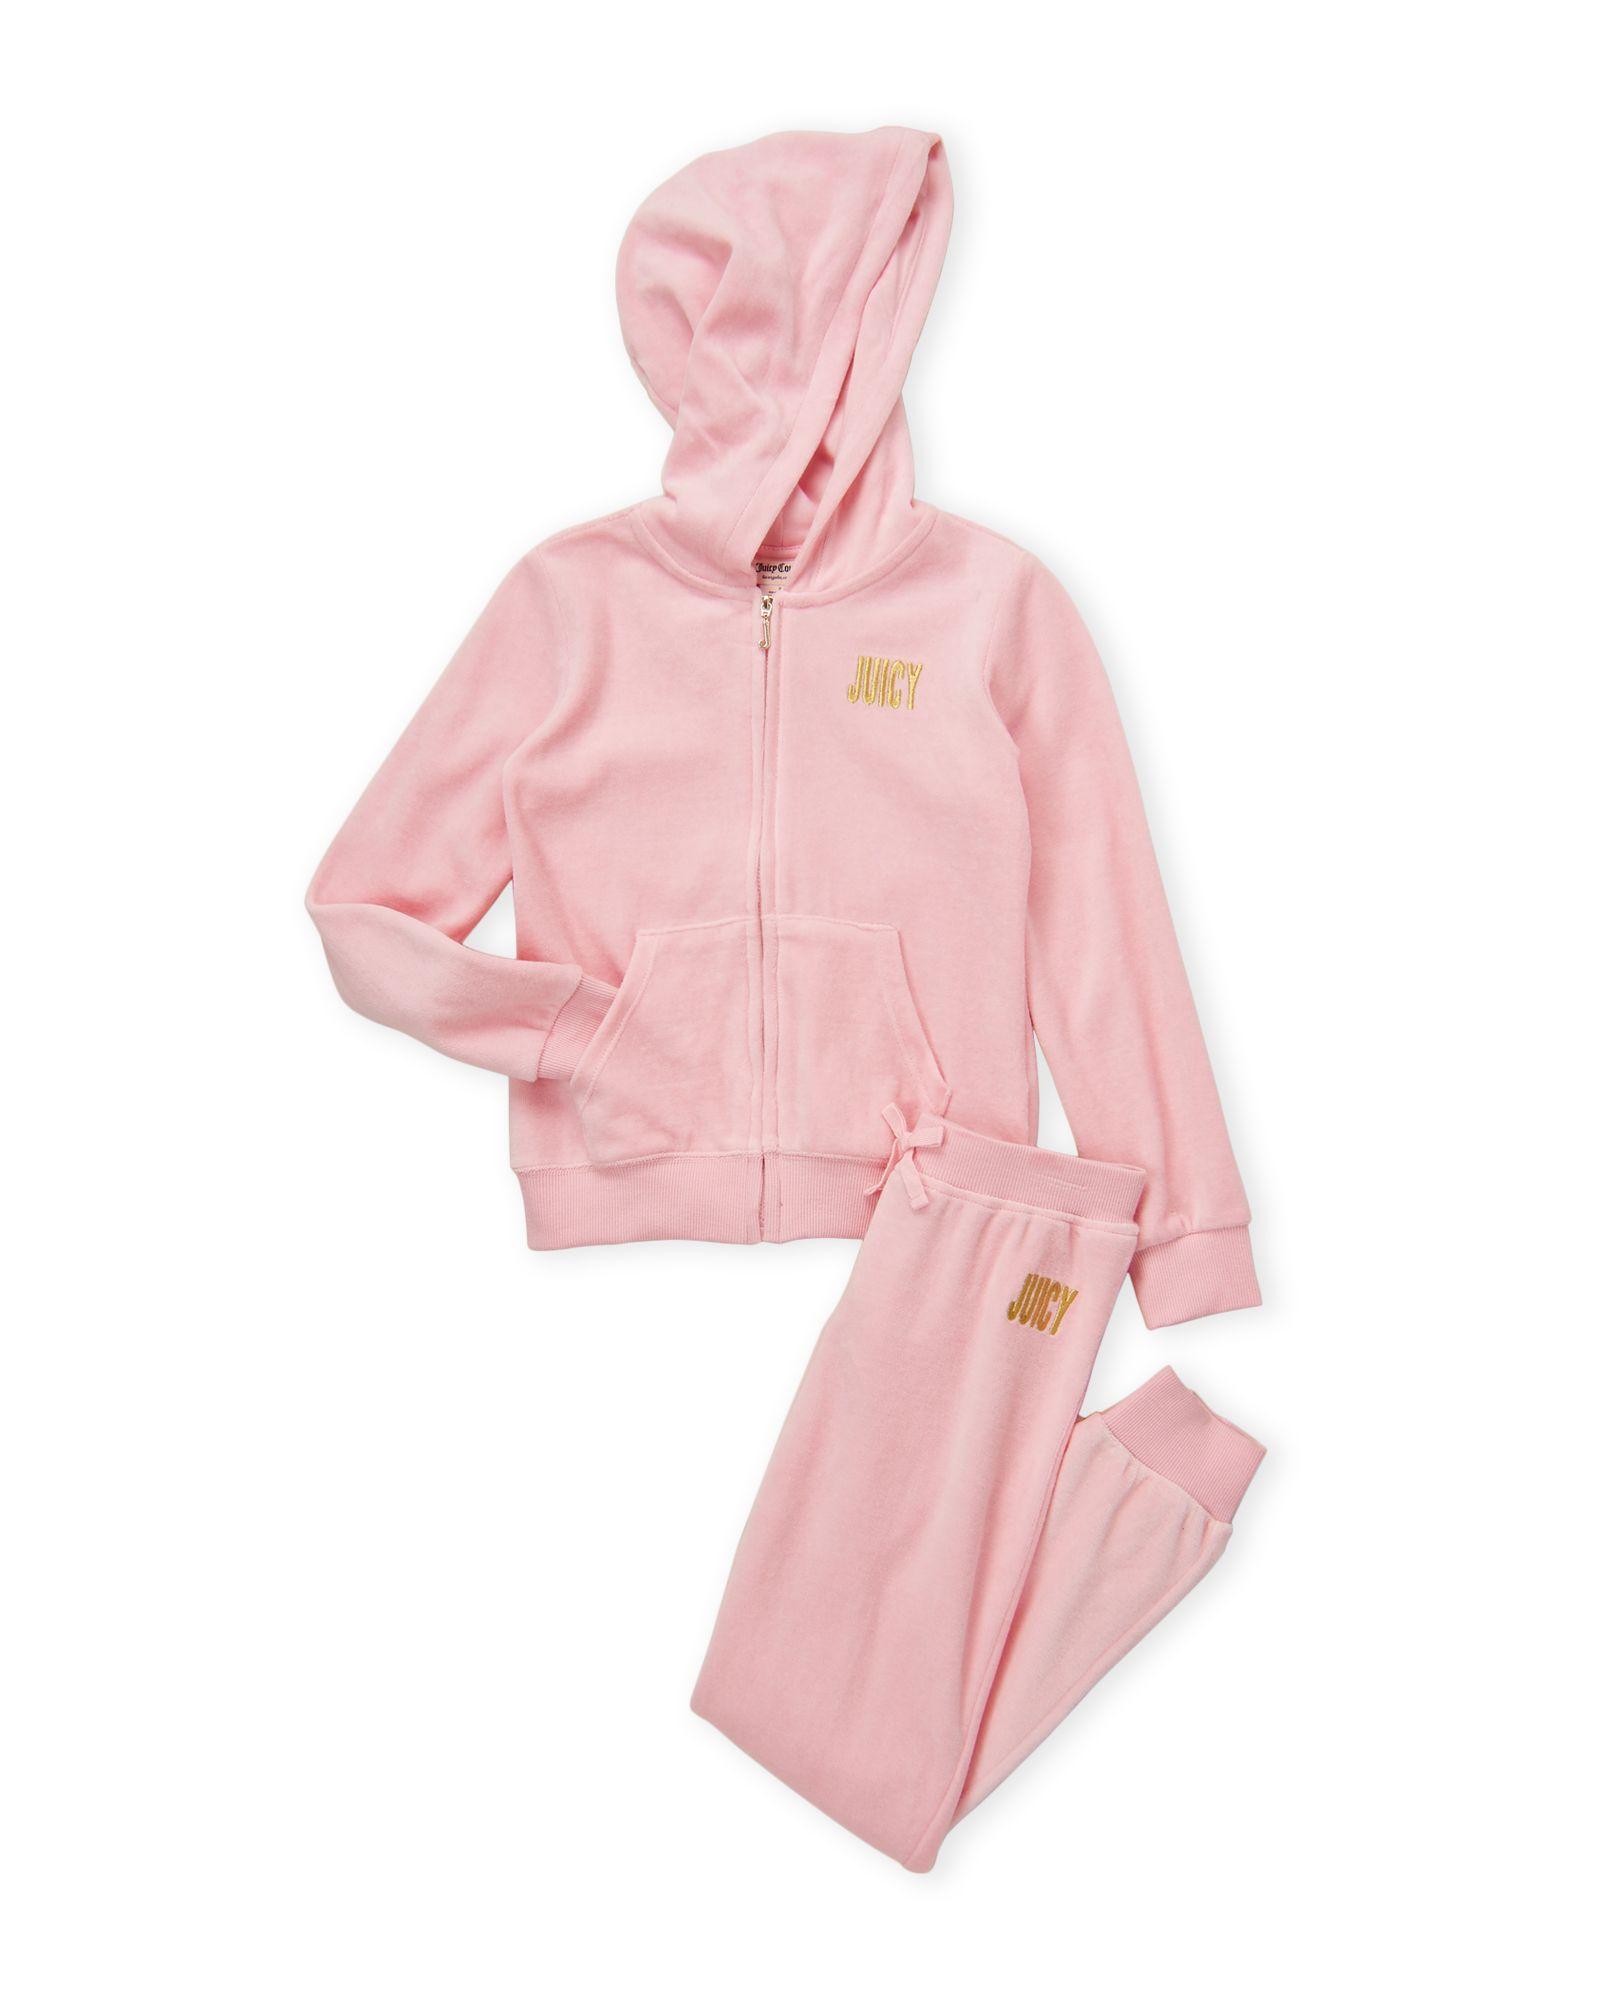 14b87065ce Juicy Couture (Girls 4-6x) 2-Piece Pink Velour Sweatsuit | *Apparel ...